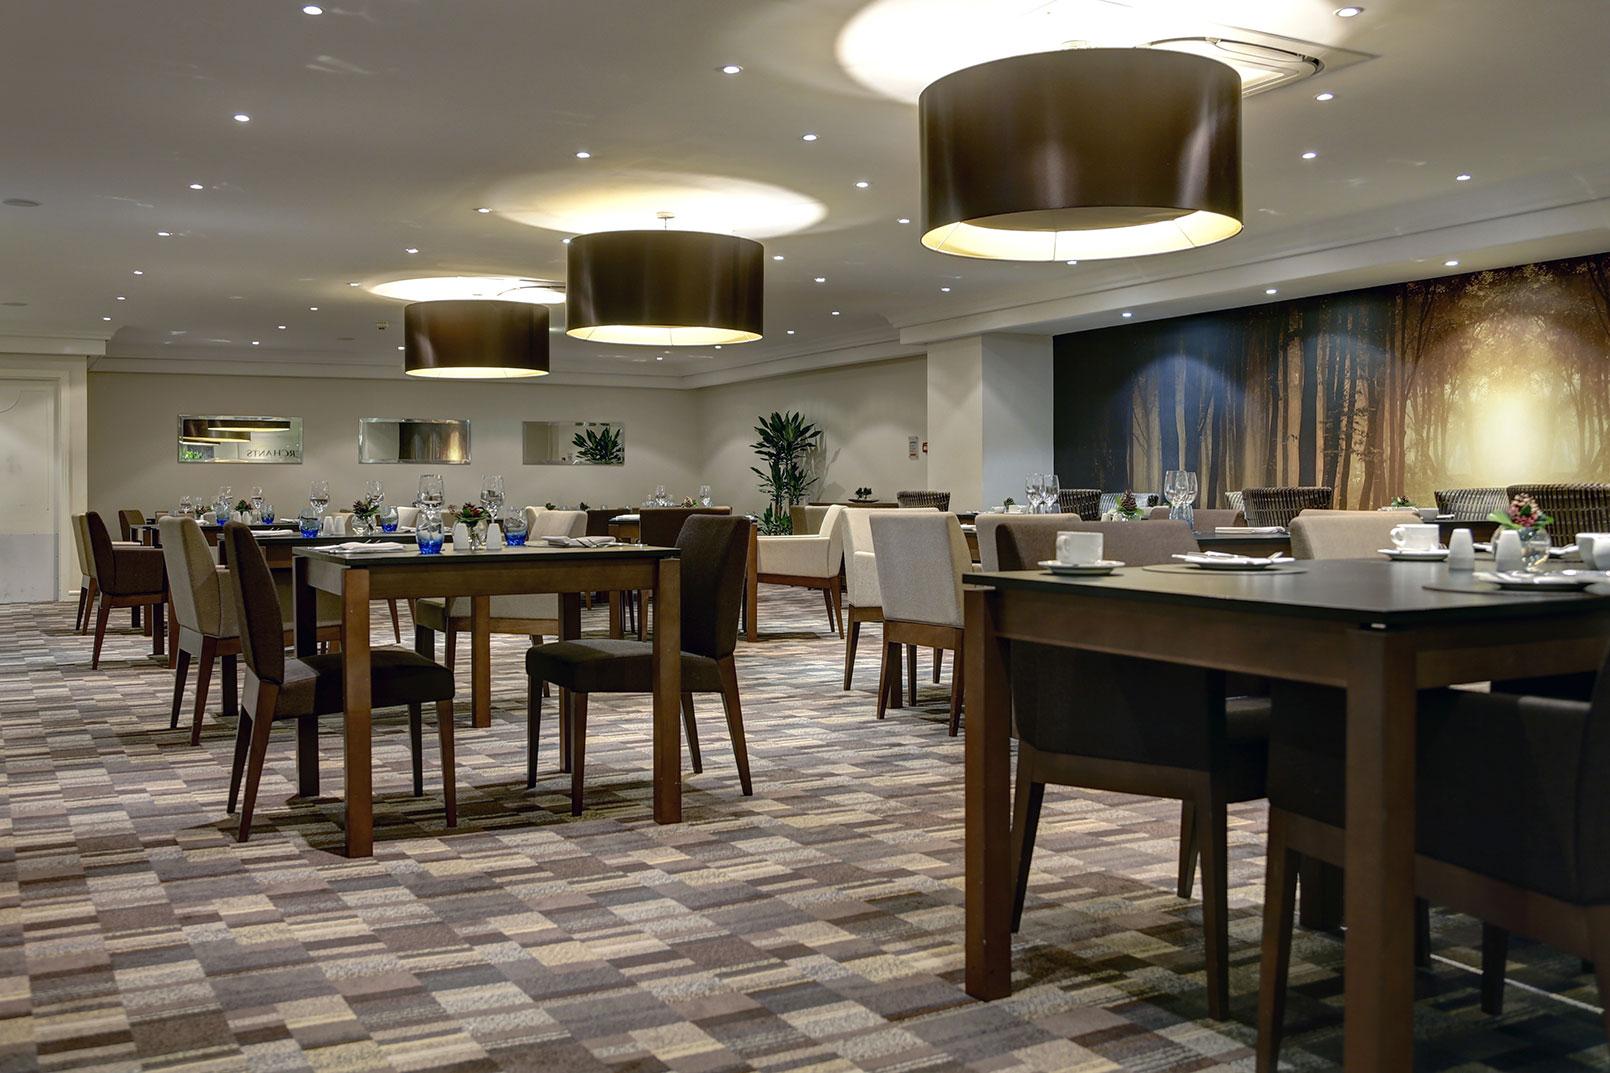 Samlesbury Hotel Restaurant